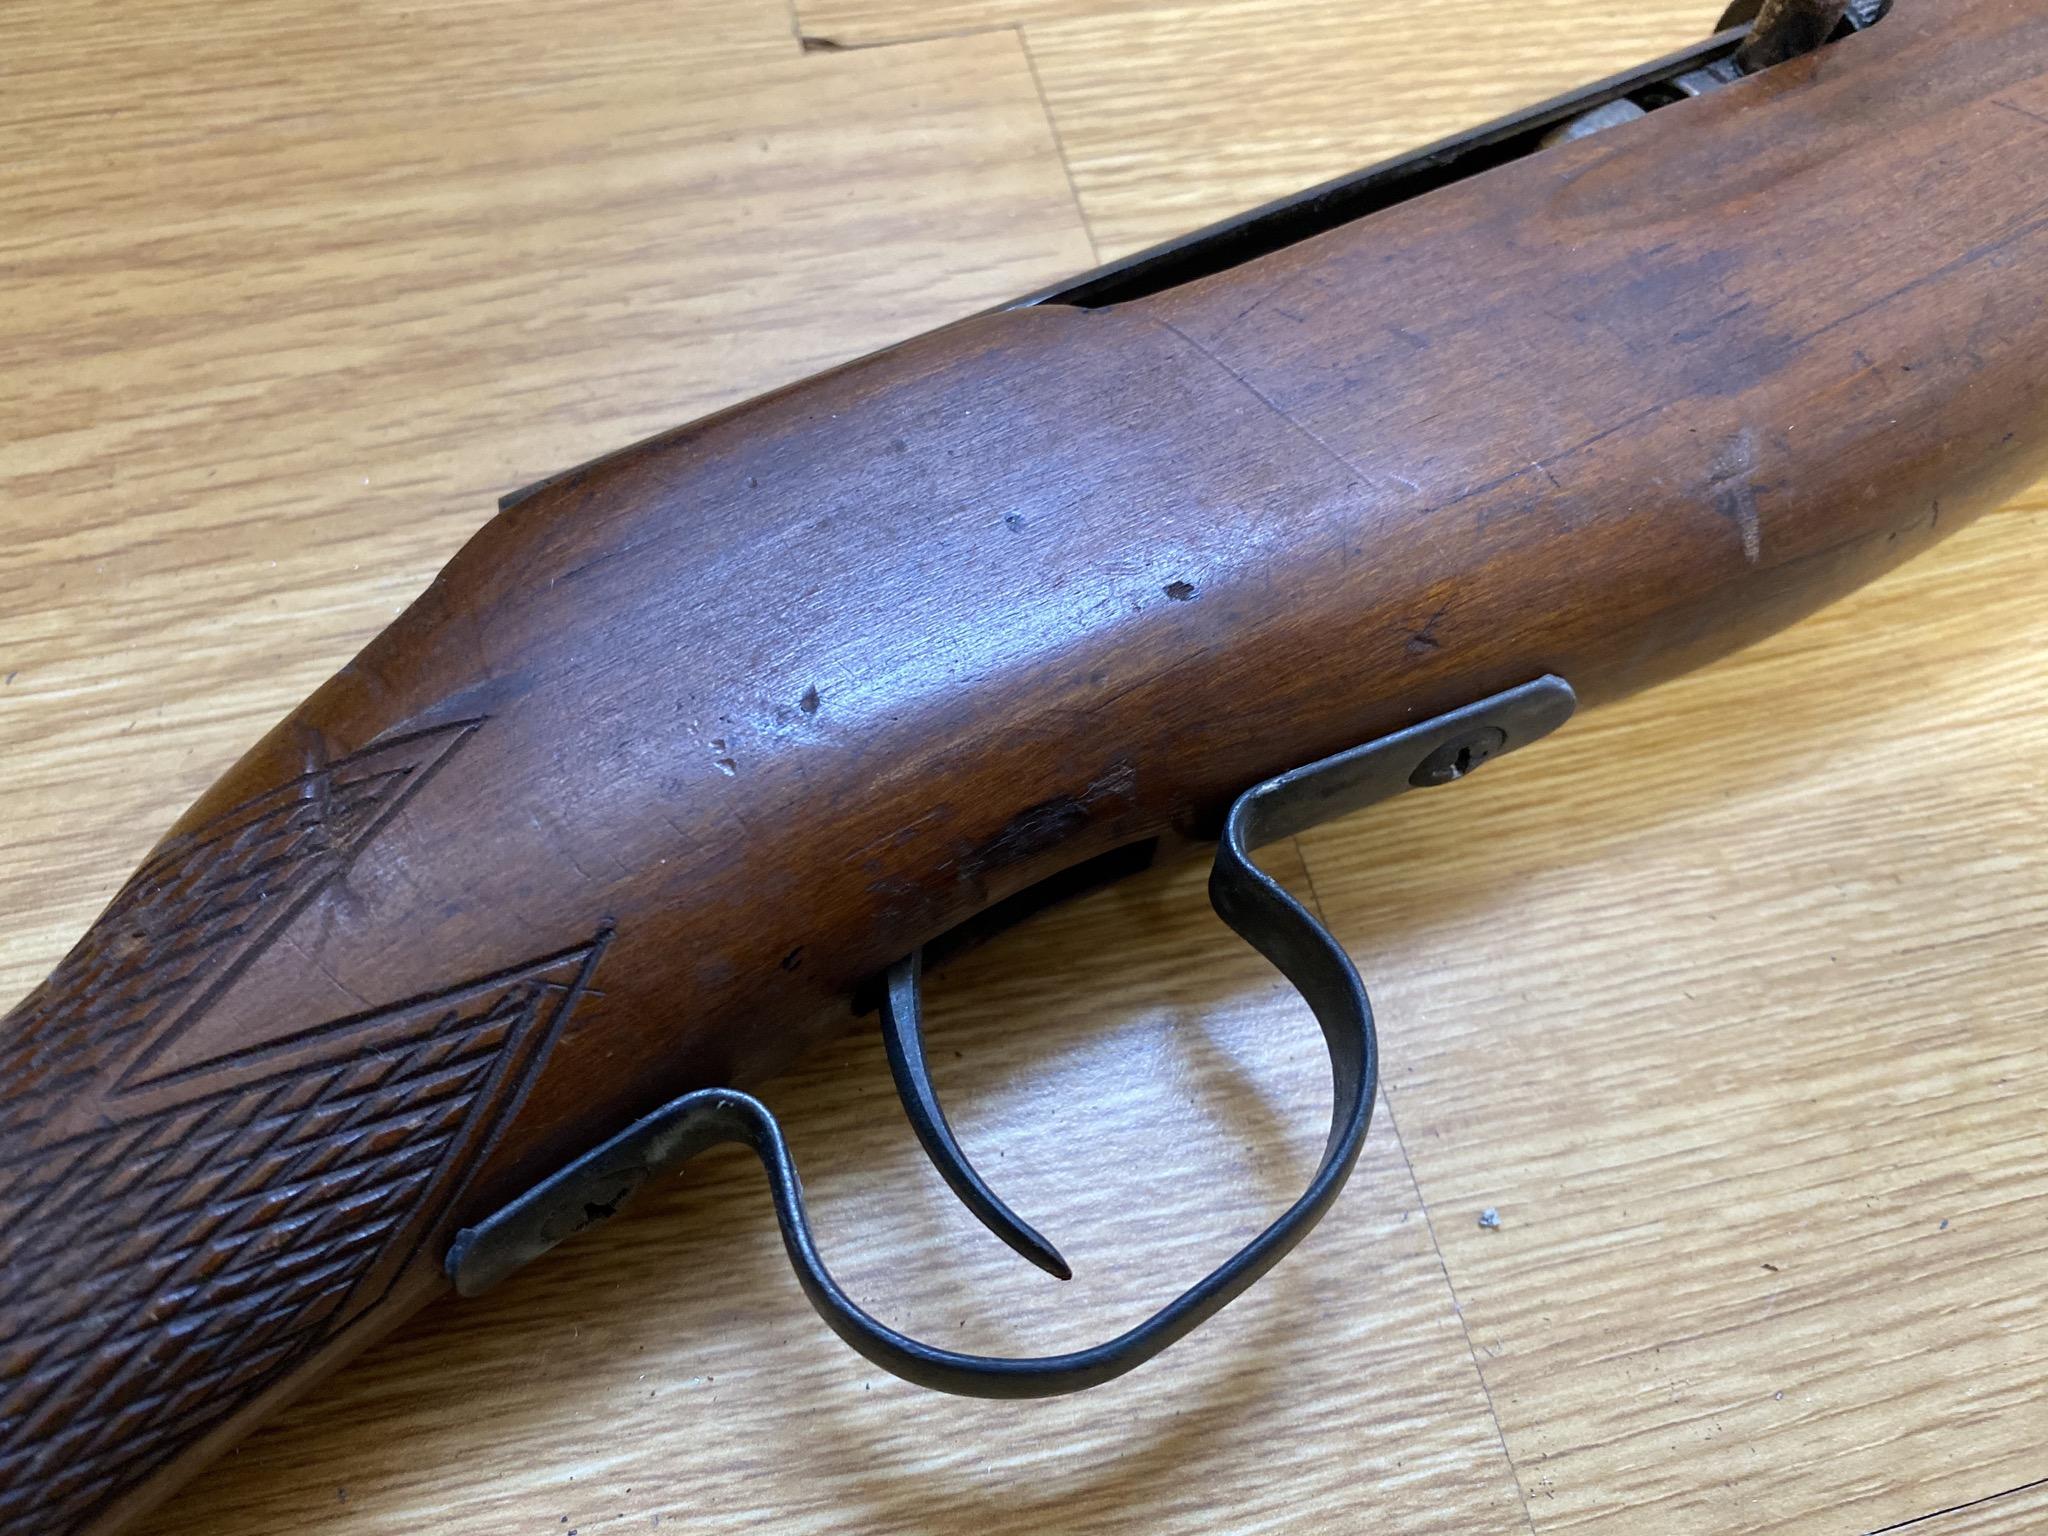 1570E63D 789B 4478 8788 653D928B3F9A - 射的銃(コルク)のレストアpart2